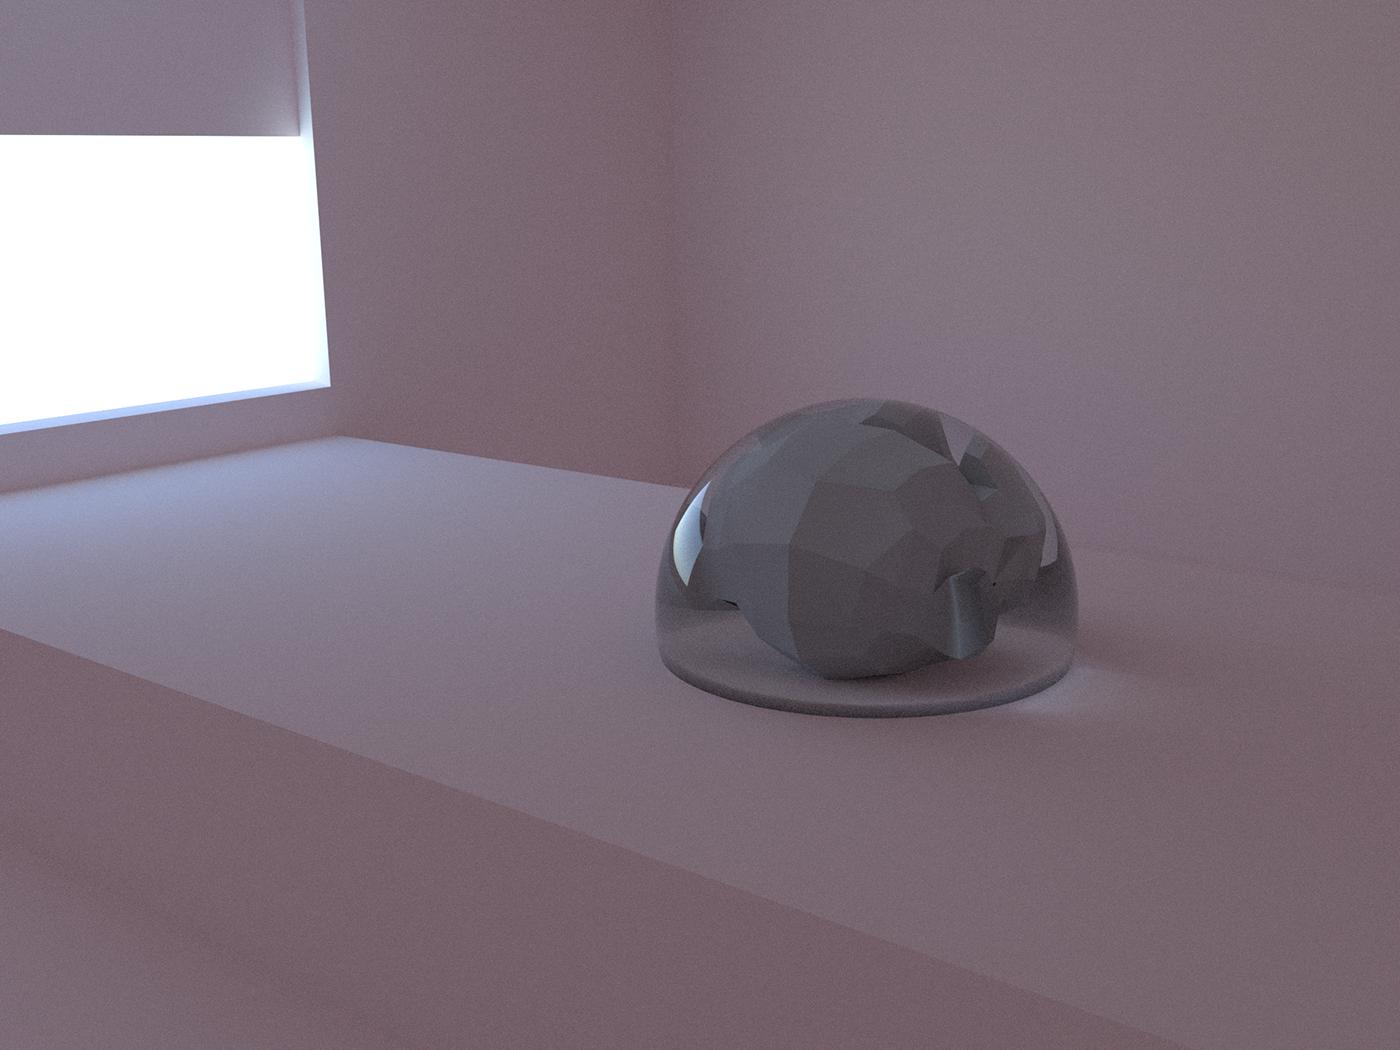 Sometimes simplicity is good; HDRI vs Caustics vs custom glass shaders.